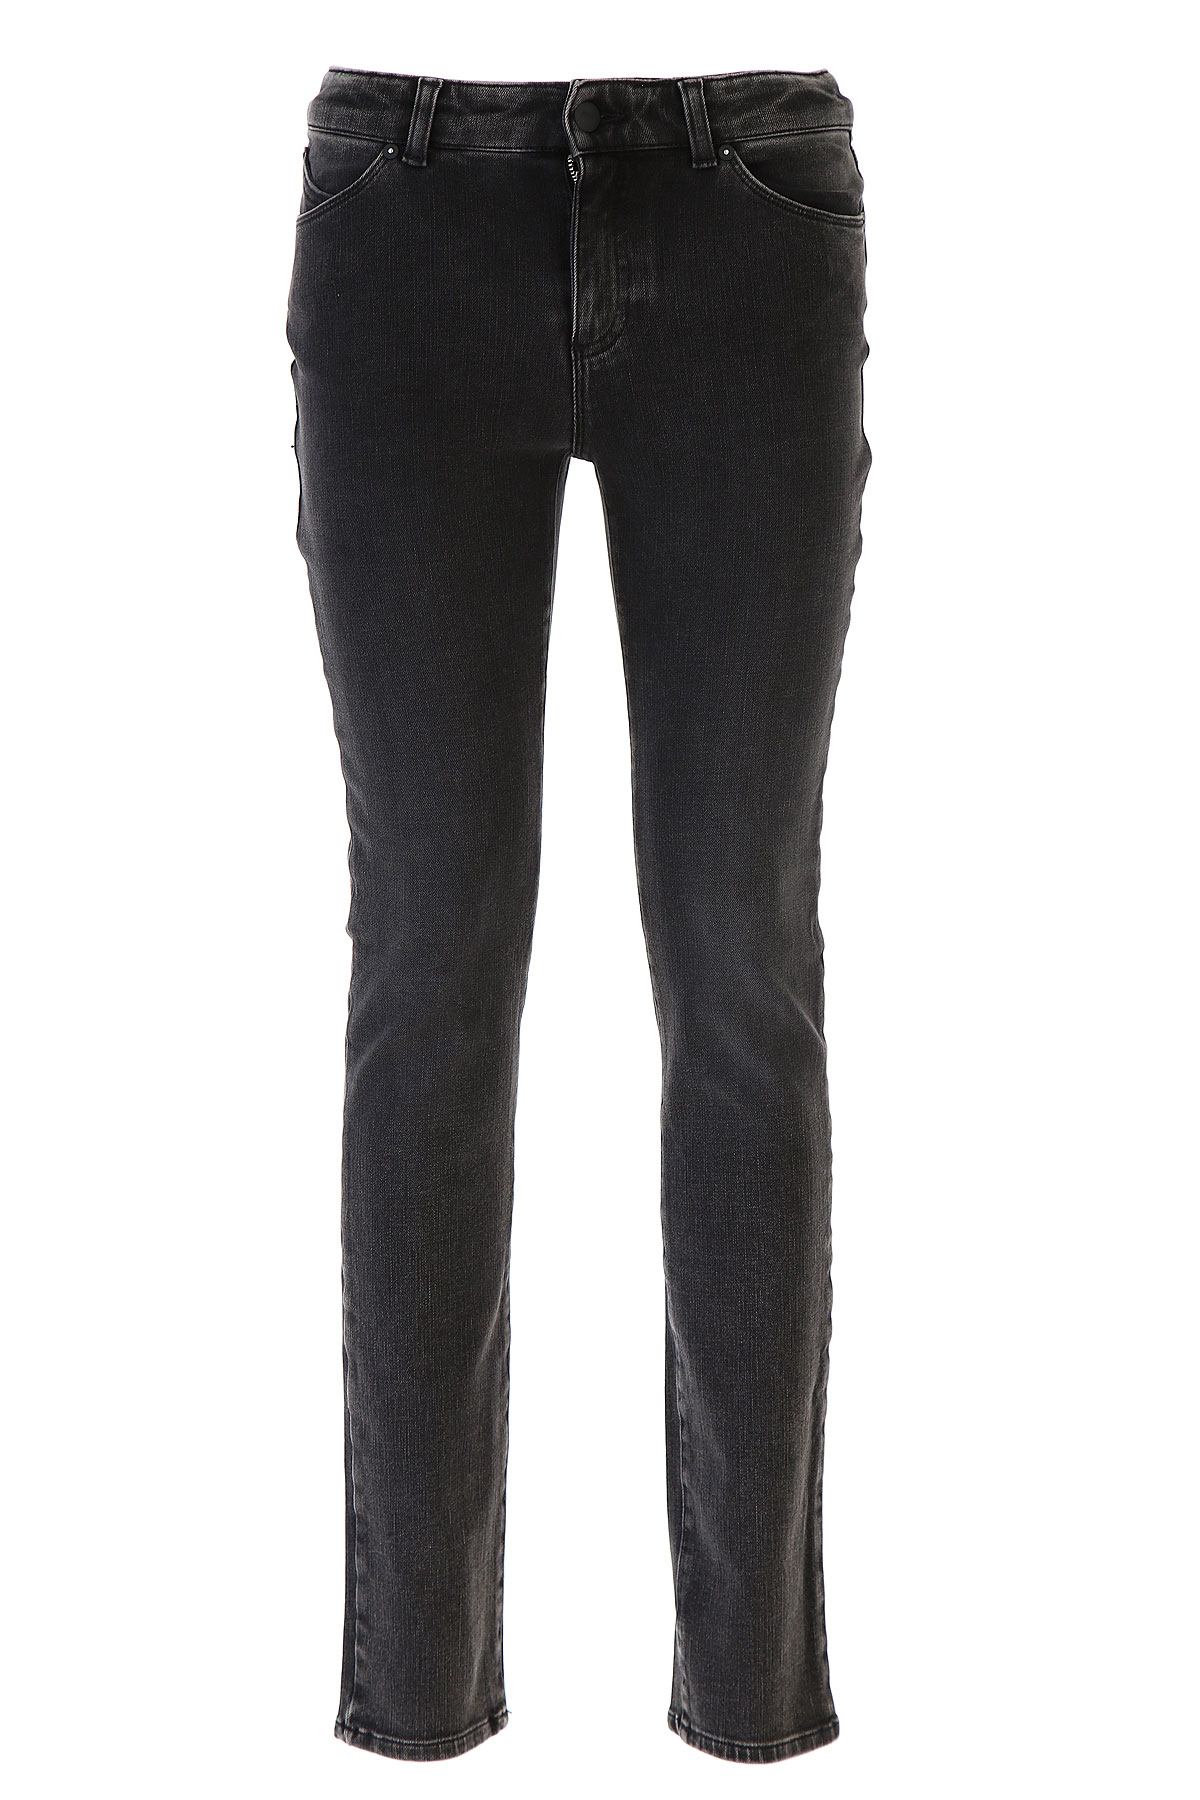 Image of Giorgio Armani Jeans On Sale, Black, Cotton, 2017, 26 27 28 29 30